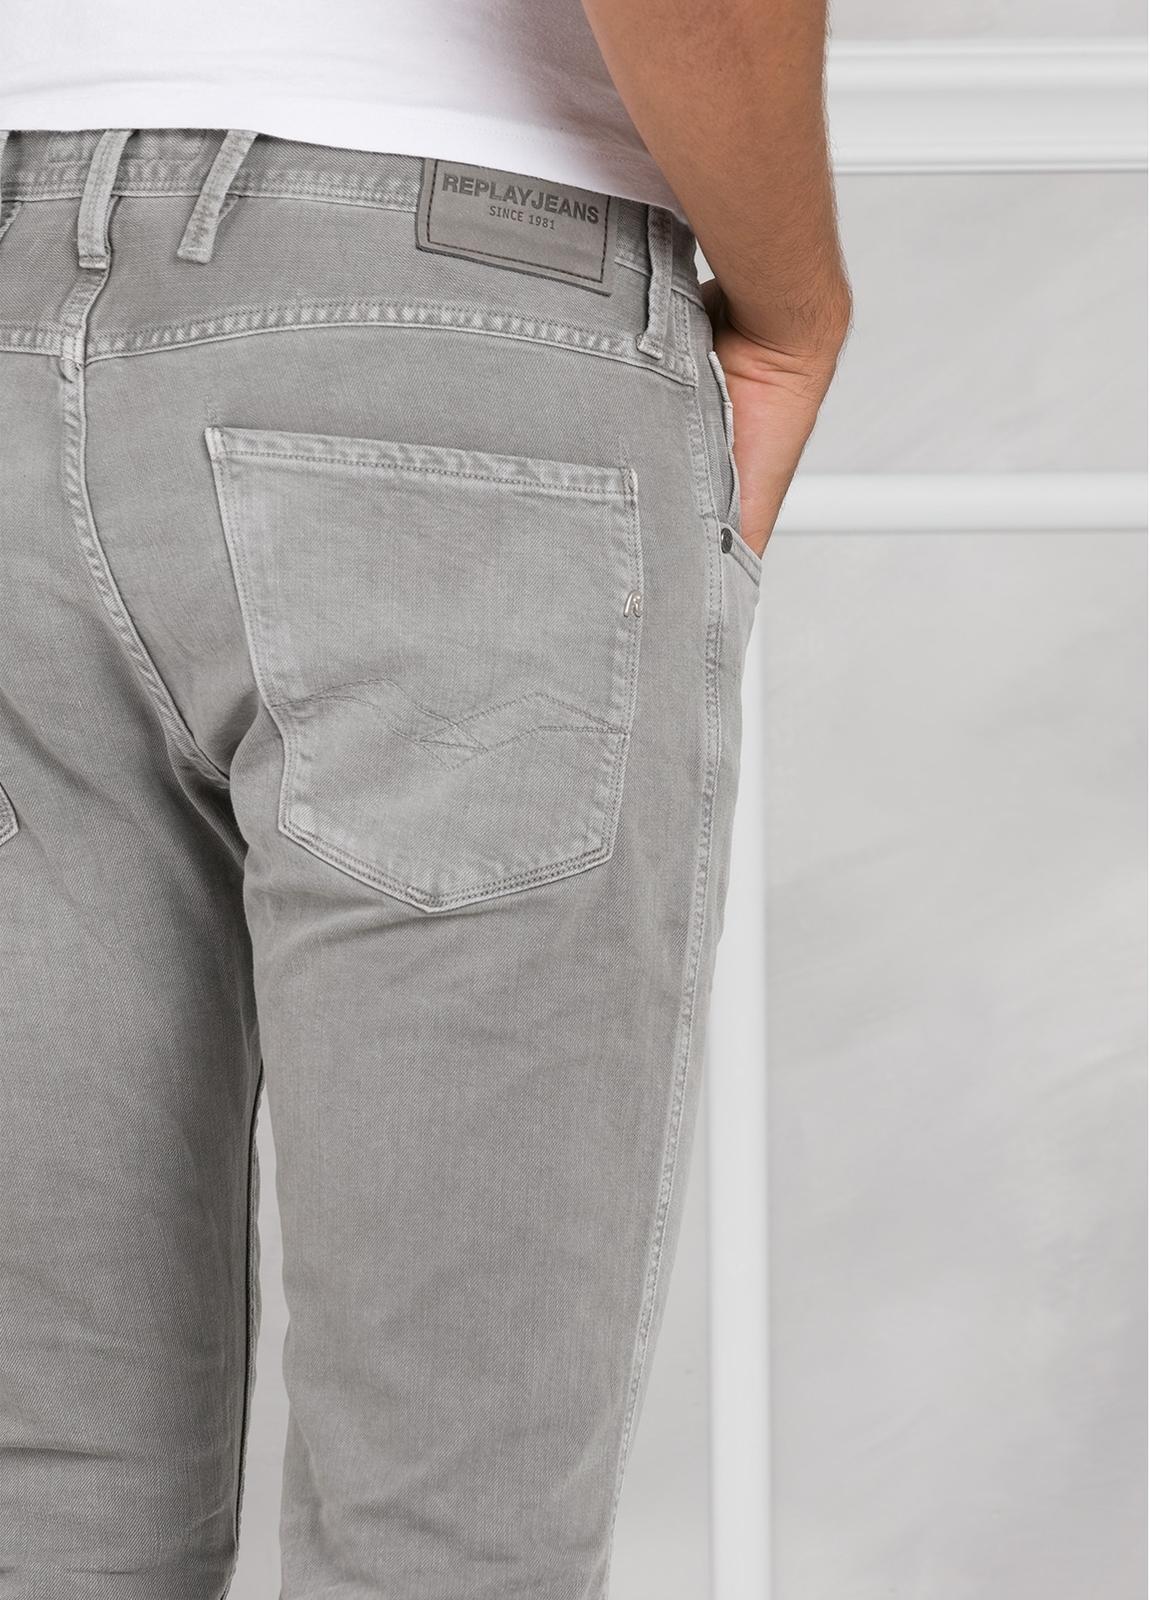 Pantalón tejano 9,5 oz SLIM M914 ANBASS color gris lavado. 98% Algodón 2% elastán. - Ítem1